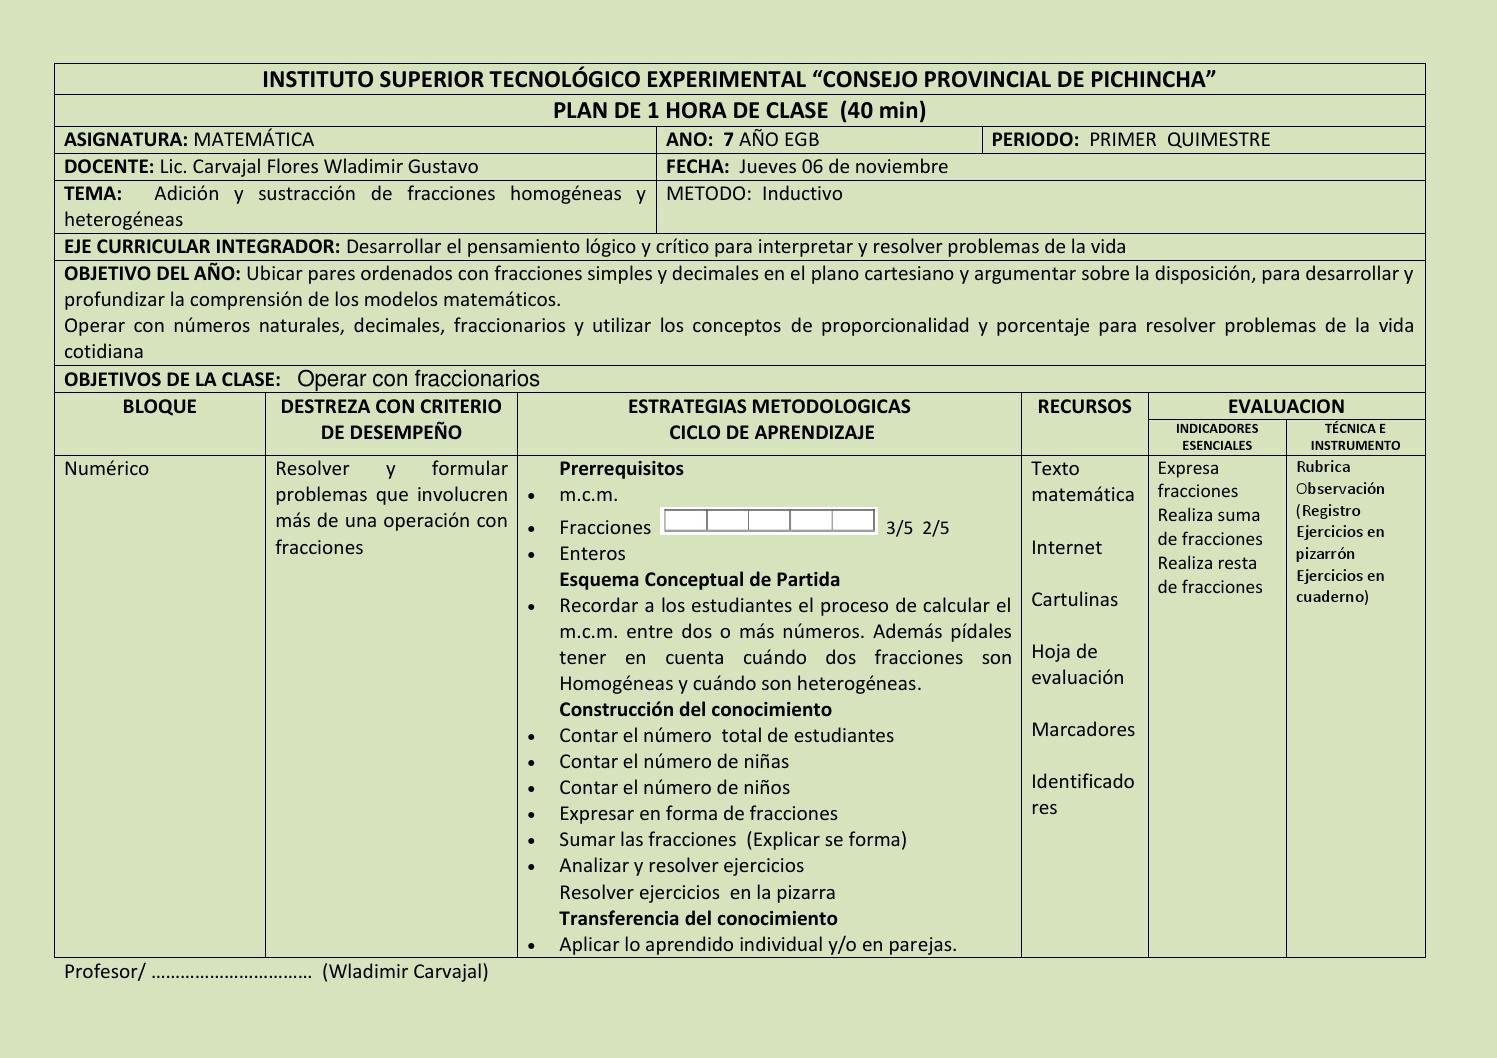 Plan de clase suma resta de fracciones by Wladimir Carvajal - issuu